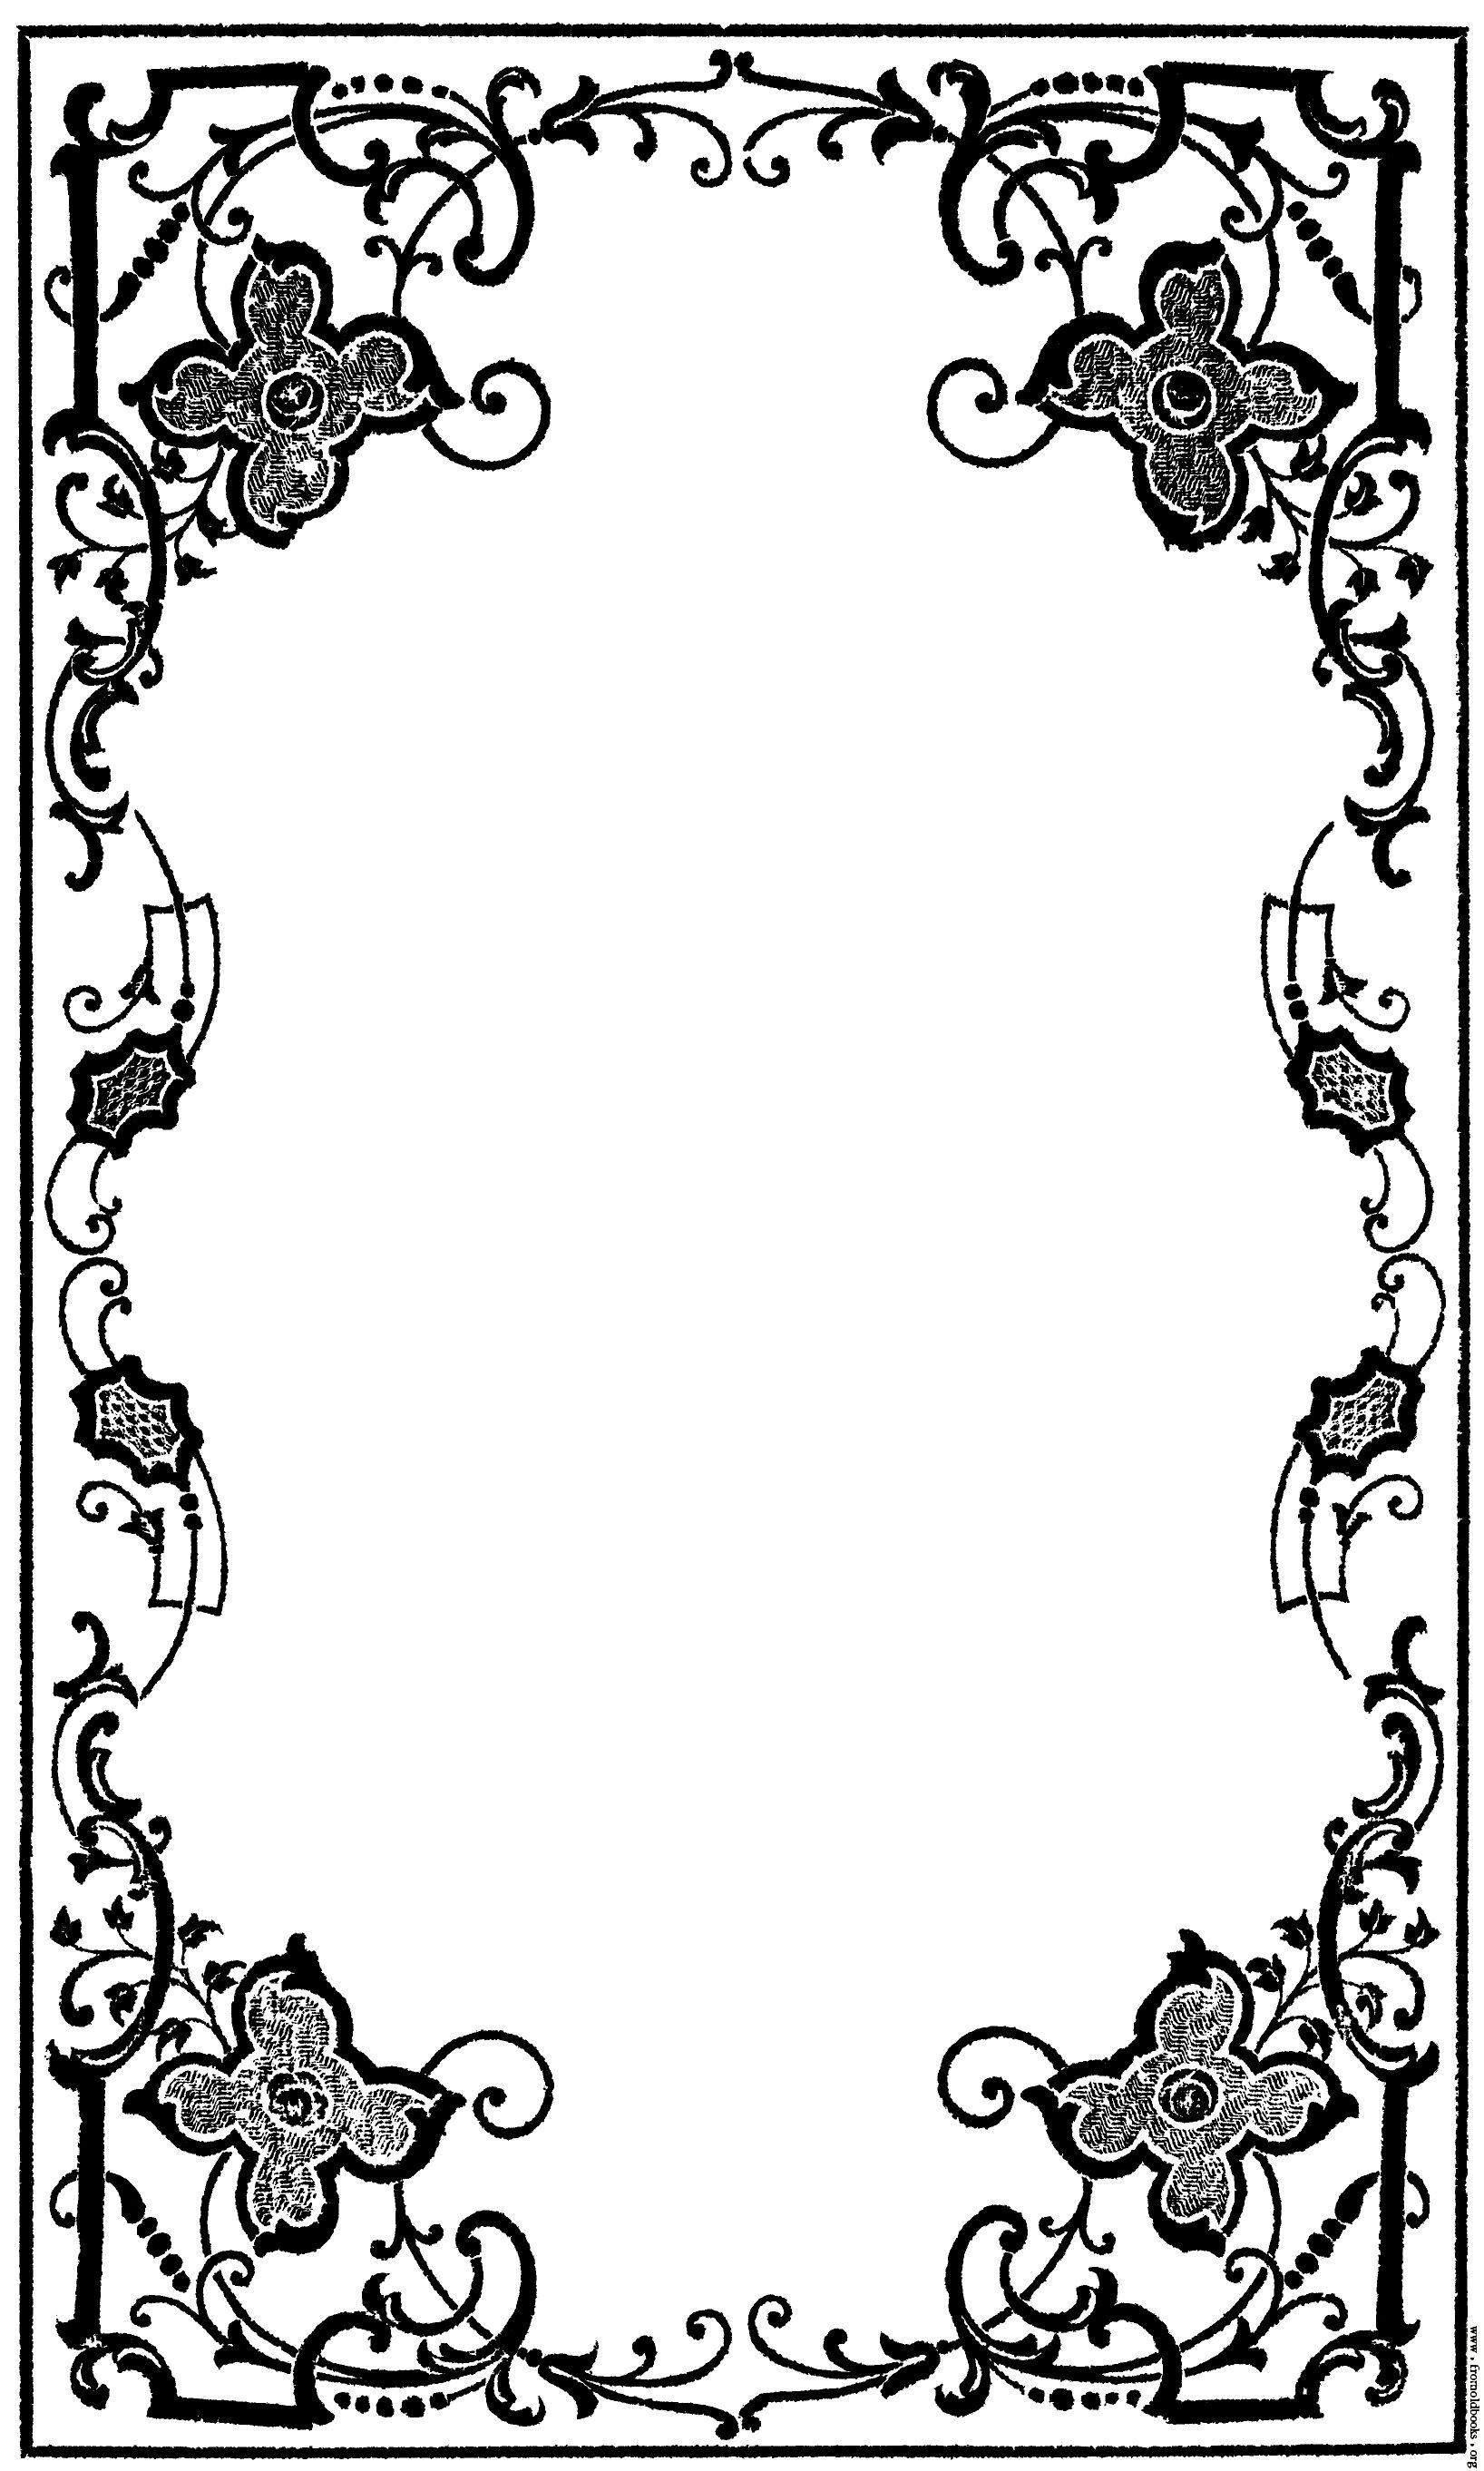 victorian book decoration google search molduras in 2018 rh pinterest com Royal Corner Borders Clip Art Fancy Borders Clip Art